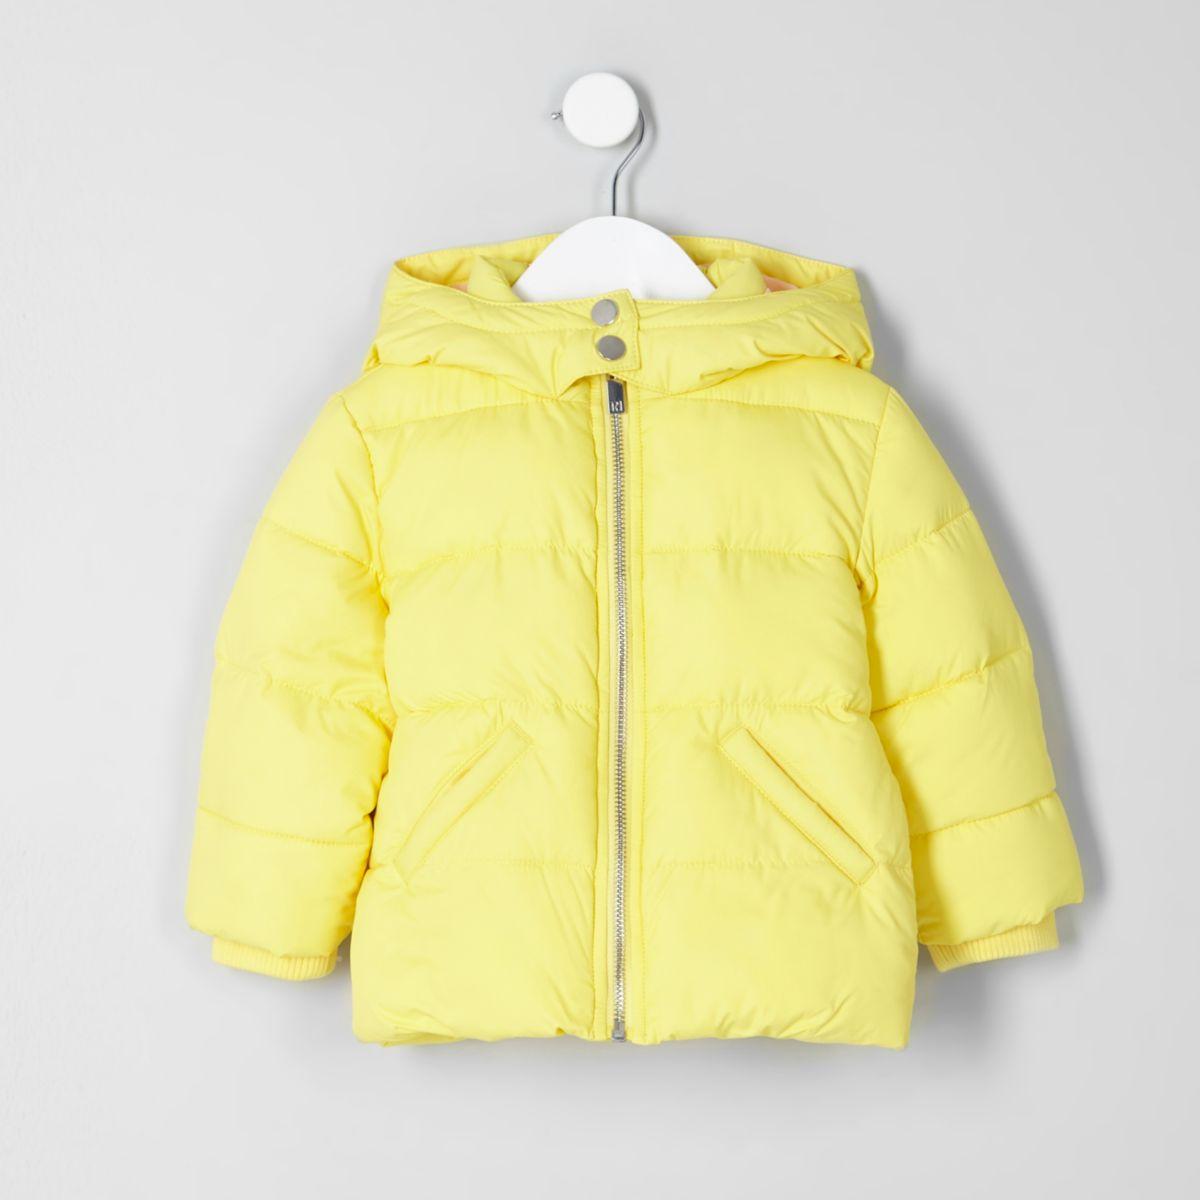 Mini girls yellow 'girls rule' puffer jacket